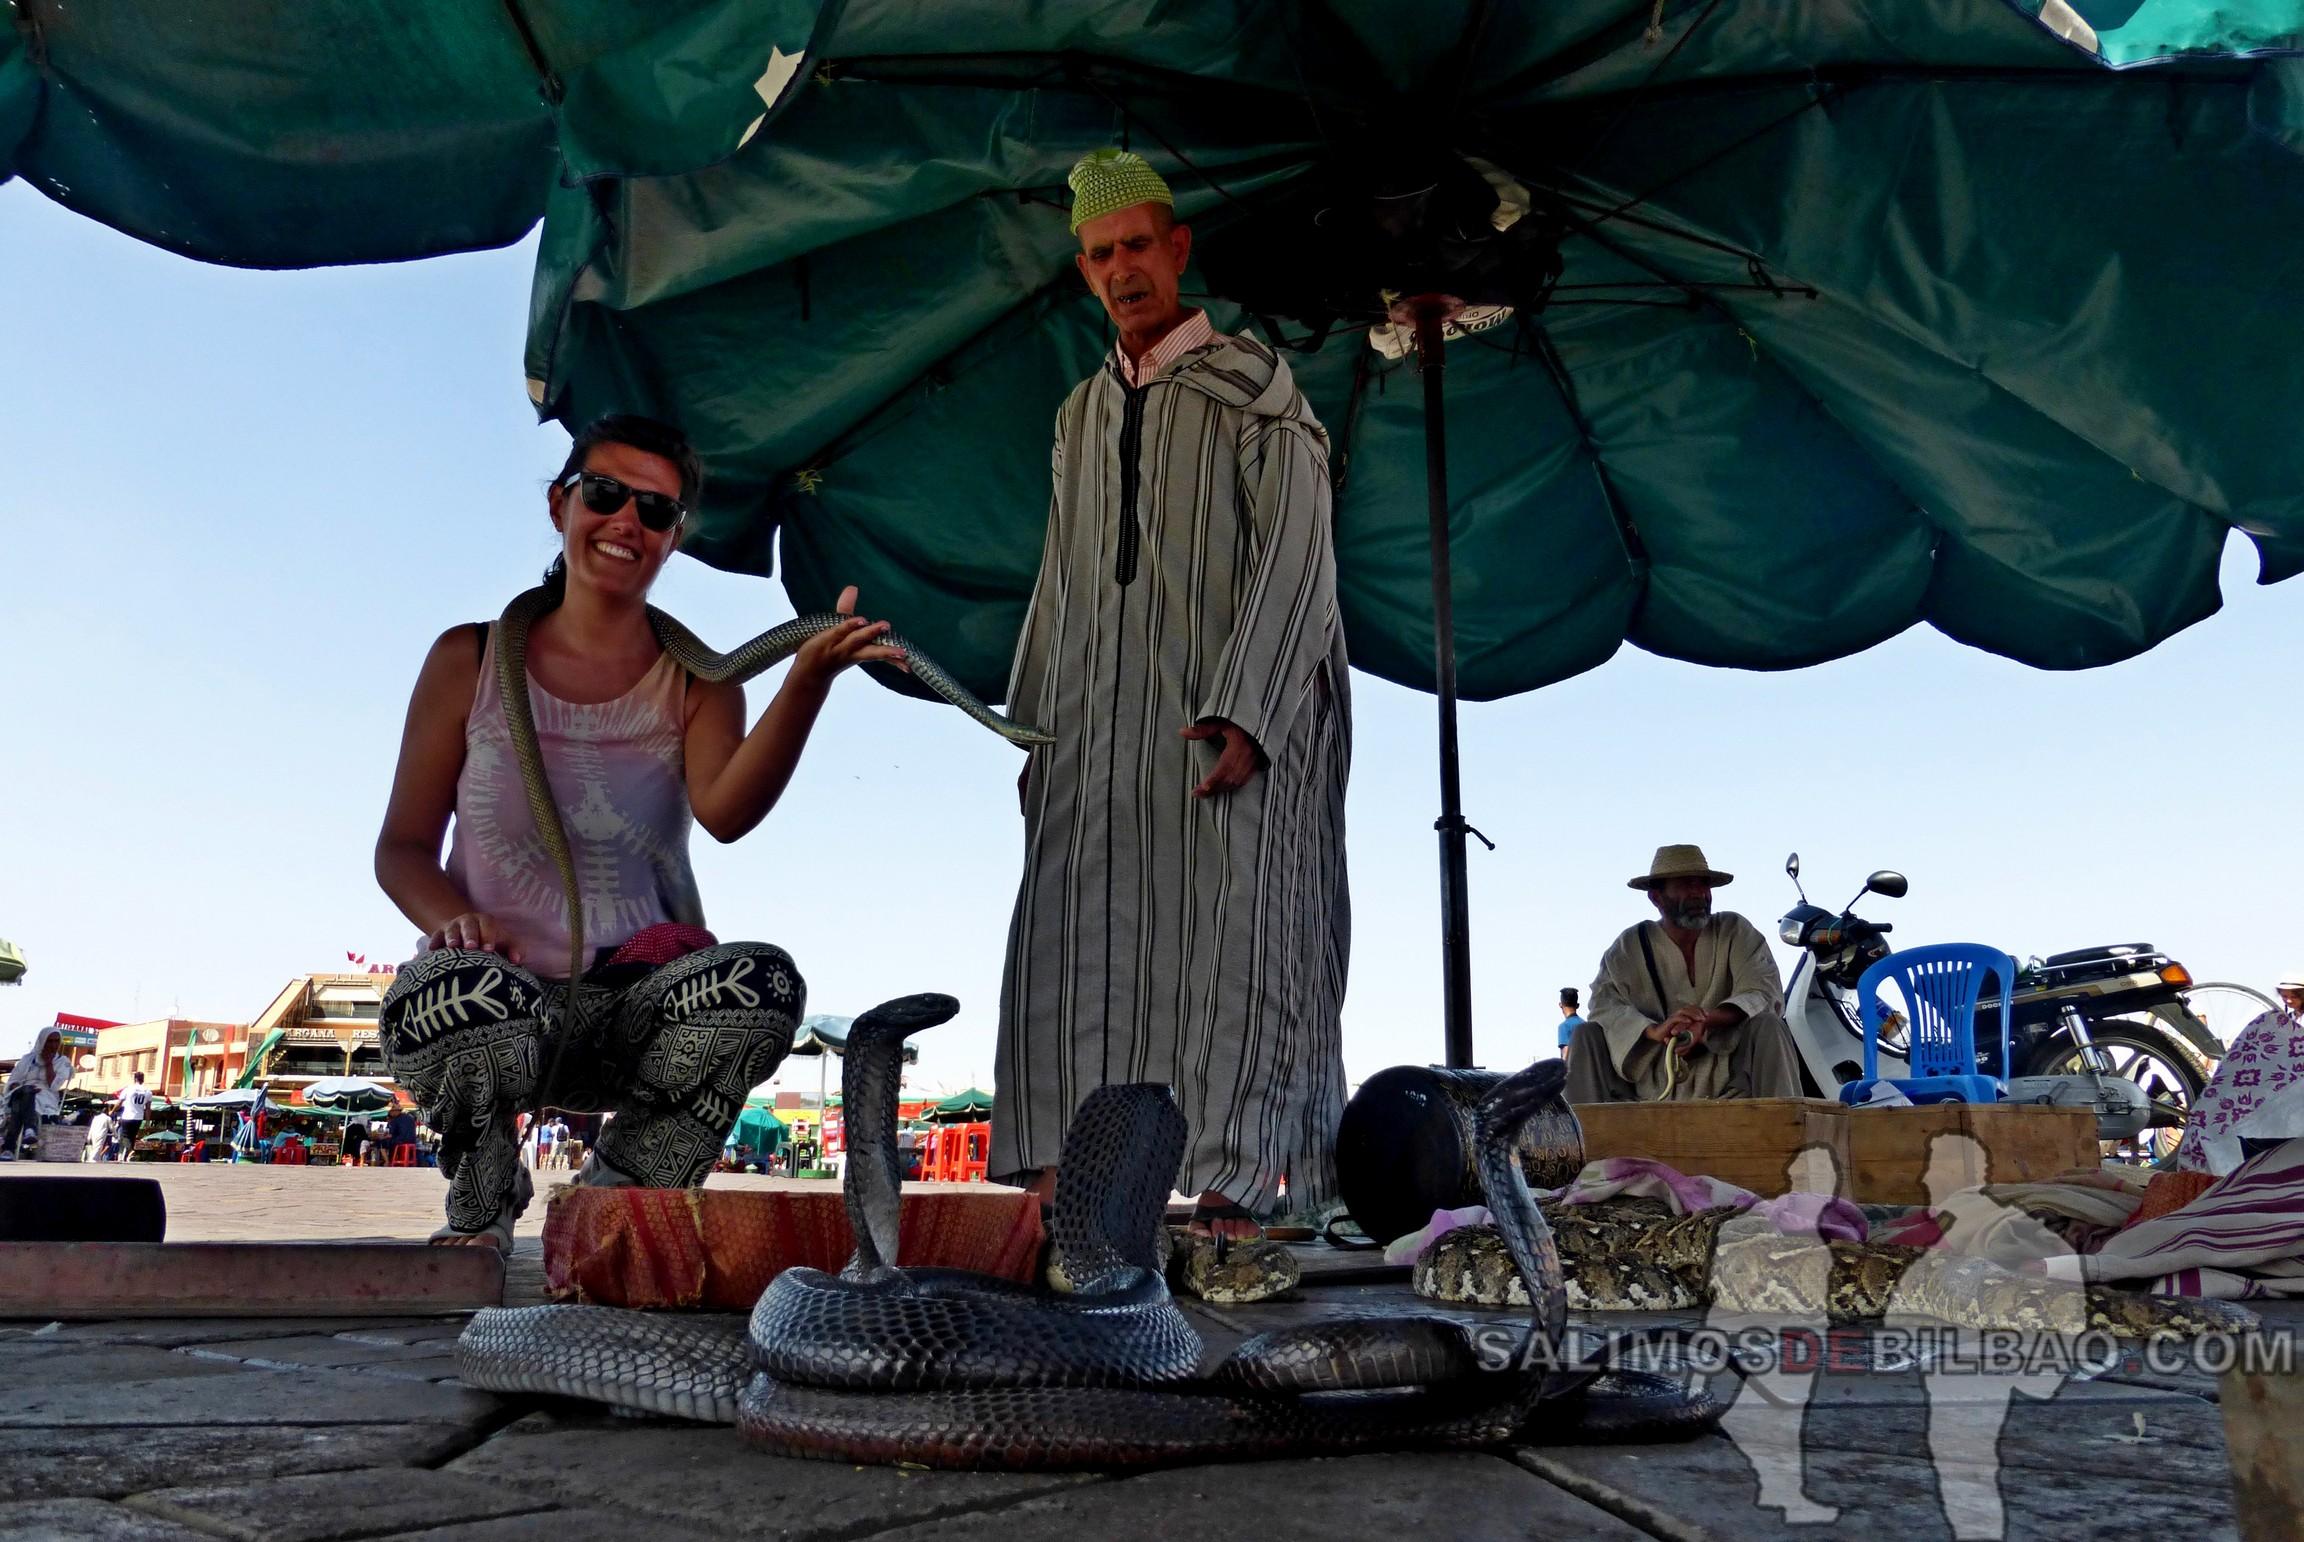 699. Saioa con las serpientes, Marrakech